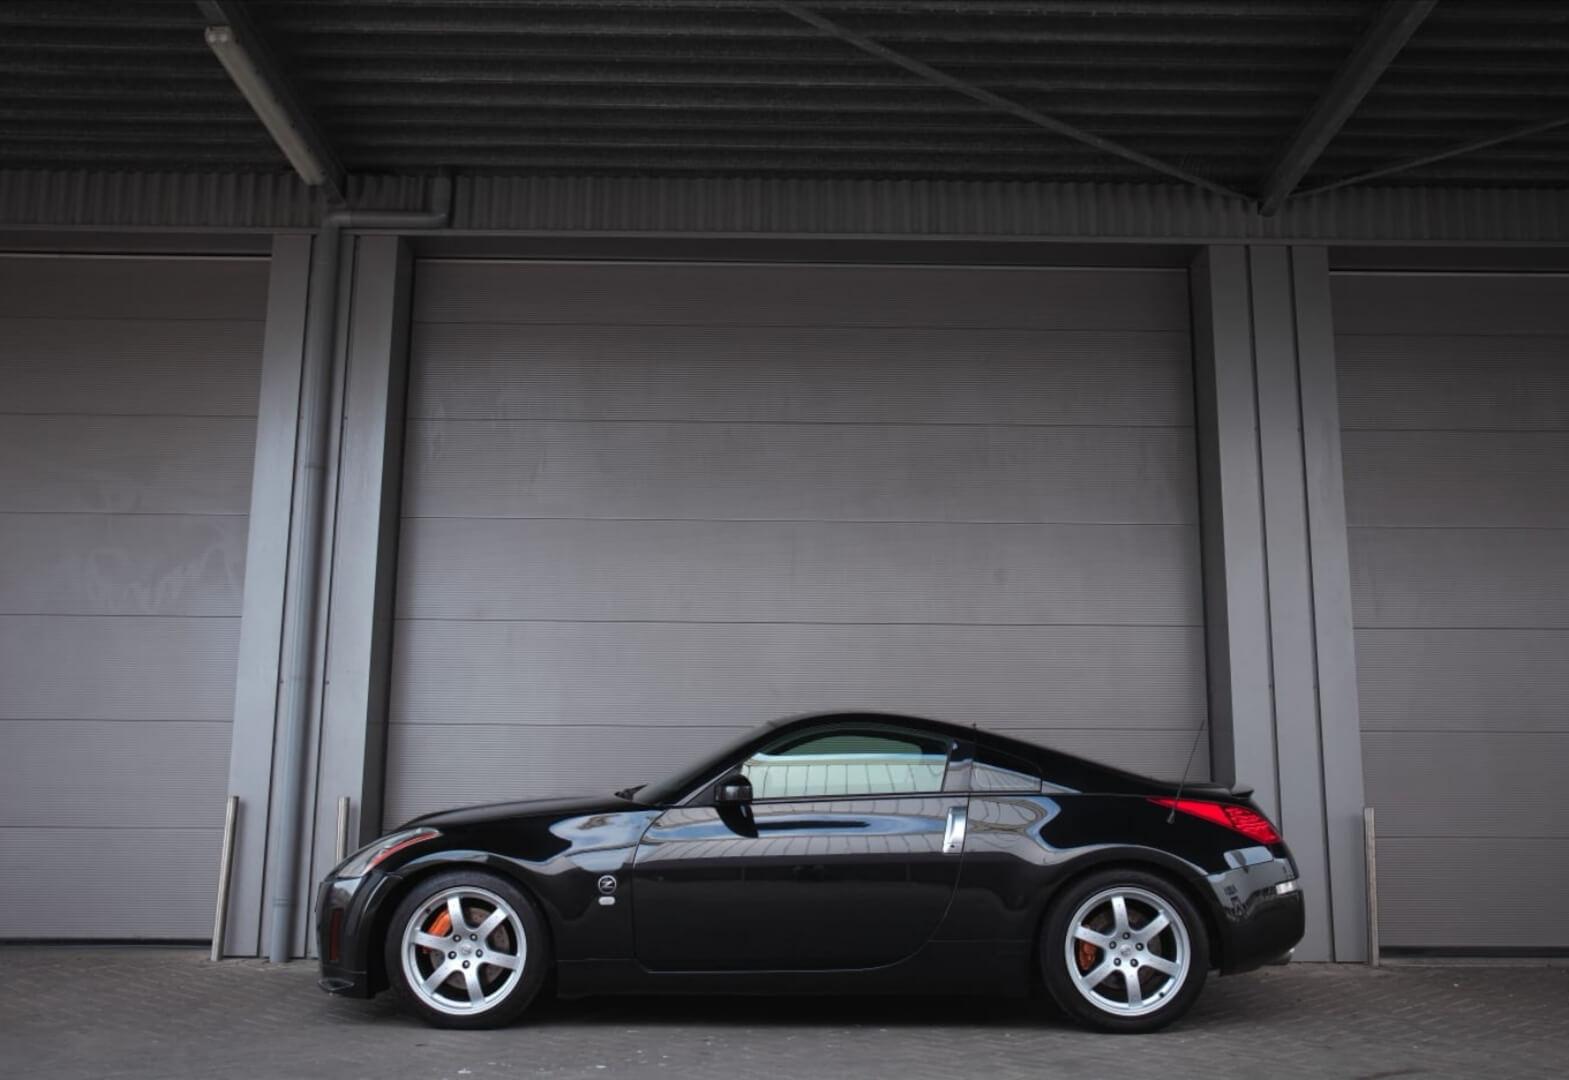 Nissan 350Z HR Track Edition 2008 side – by Next Level Automotive – Go to nextlevelautomotive.eu